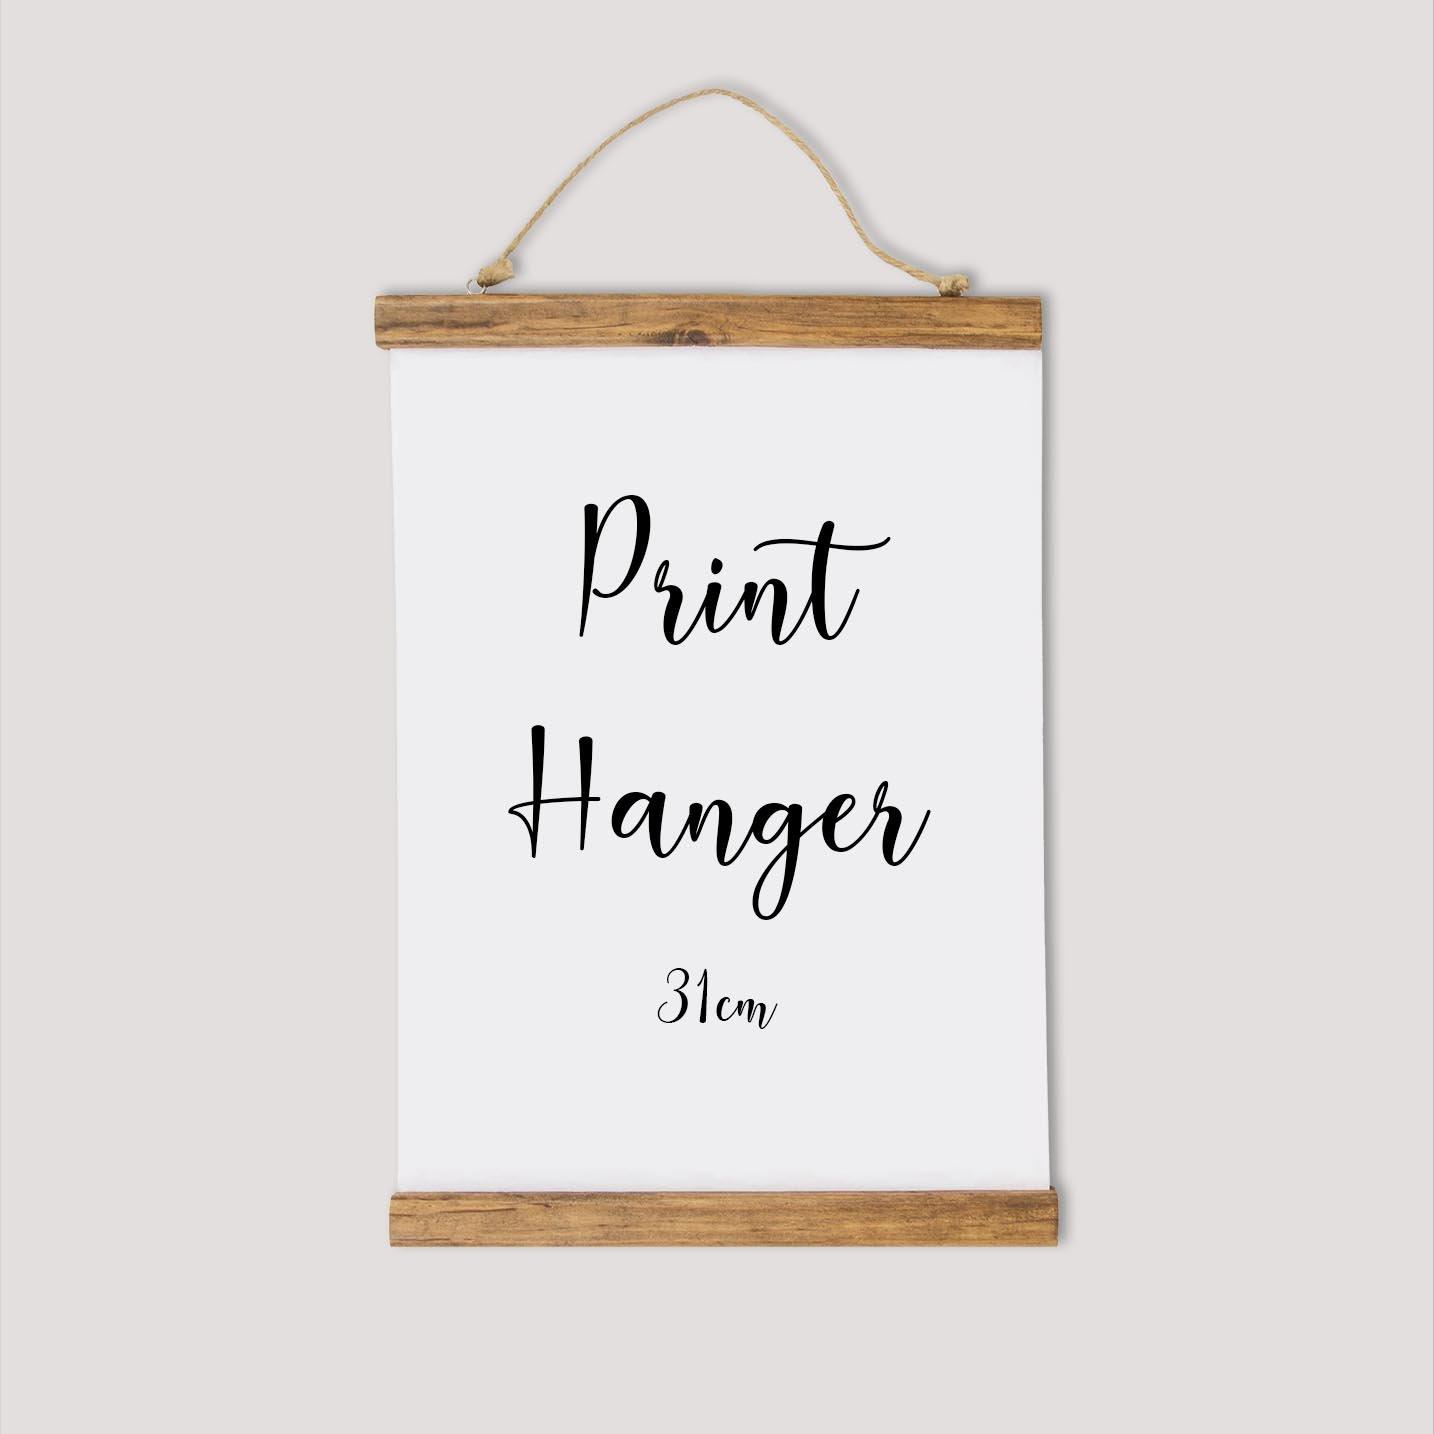 Image of Wooden Print Hanger - 31 cm